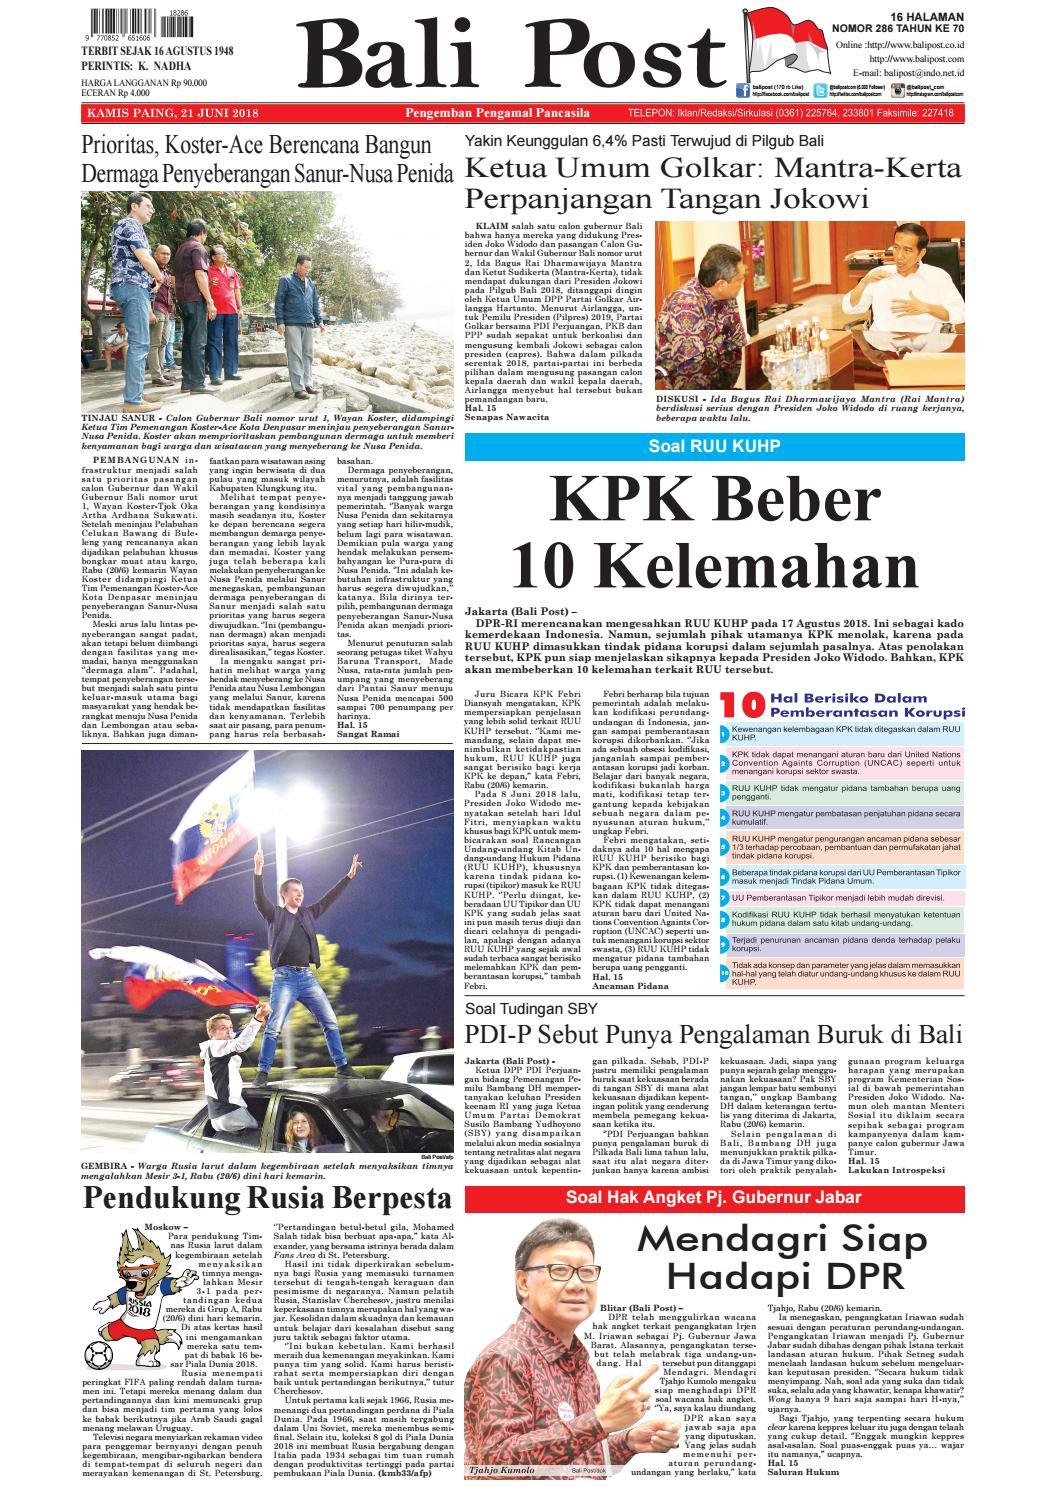 Edisi Kamis 21 Juni 2018 Balipostcom By E Paper KMB Issuu